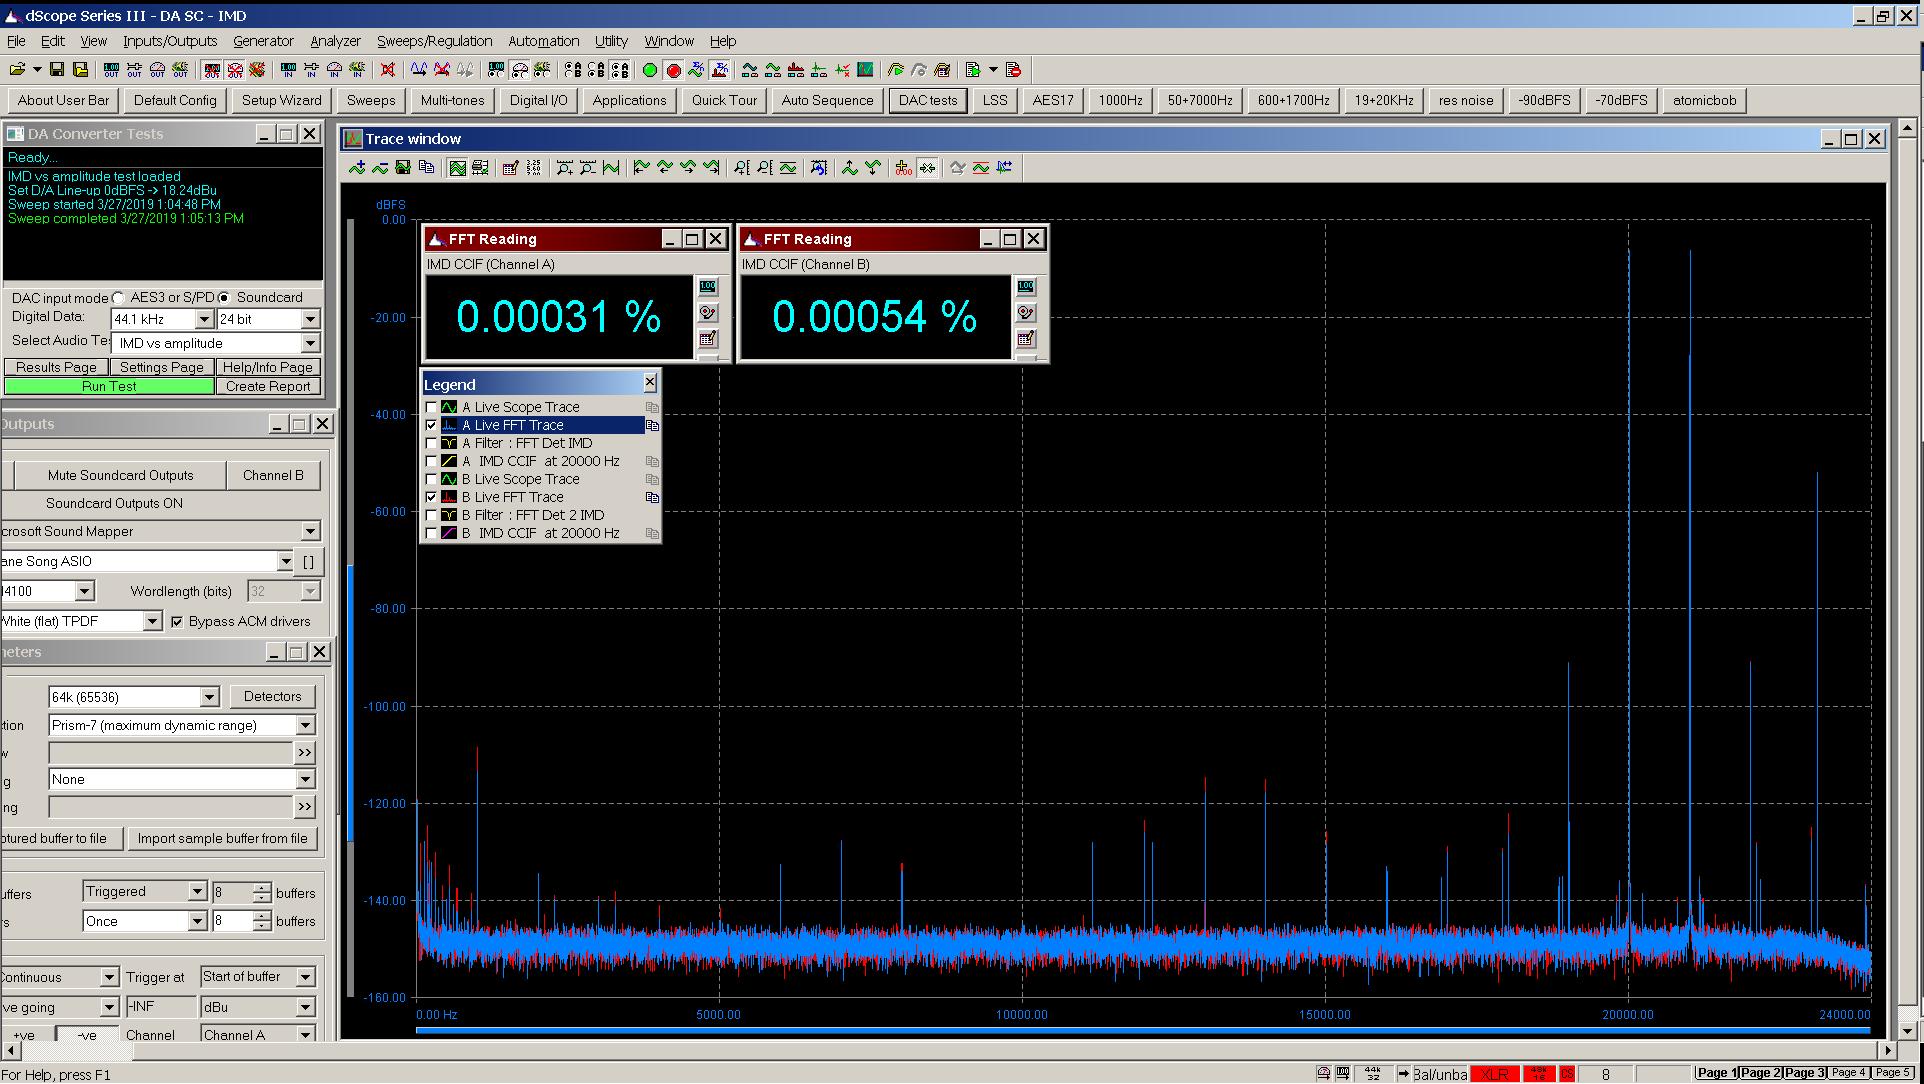 20190327-04 solaris Bal IMD spectrum - USB.PNG